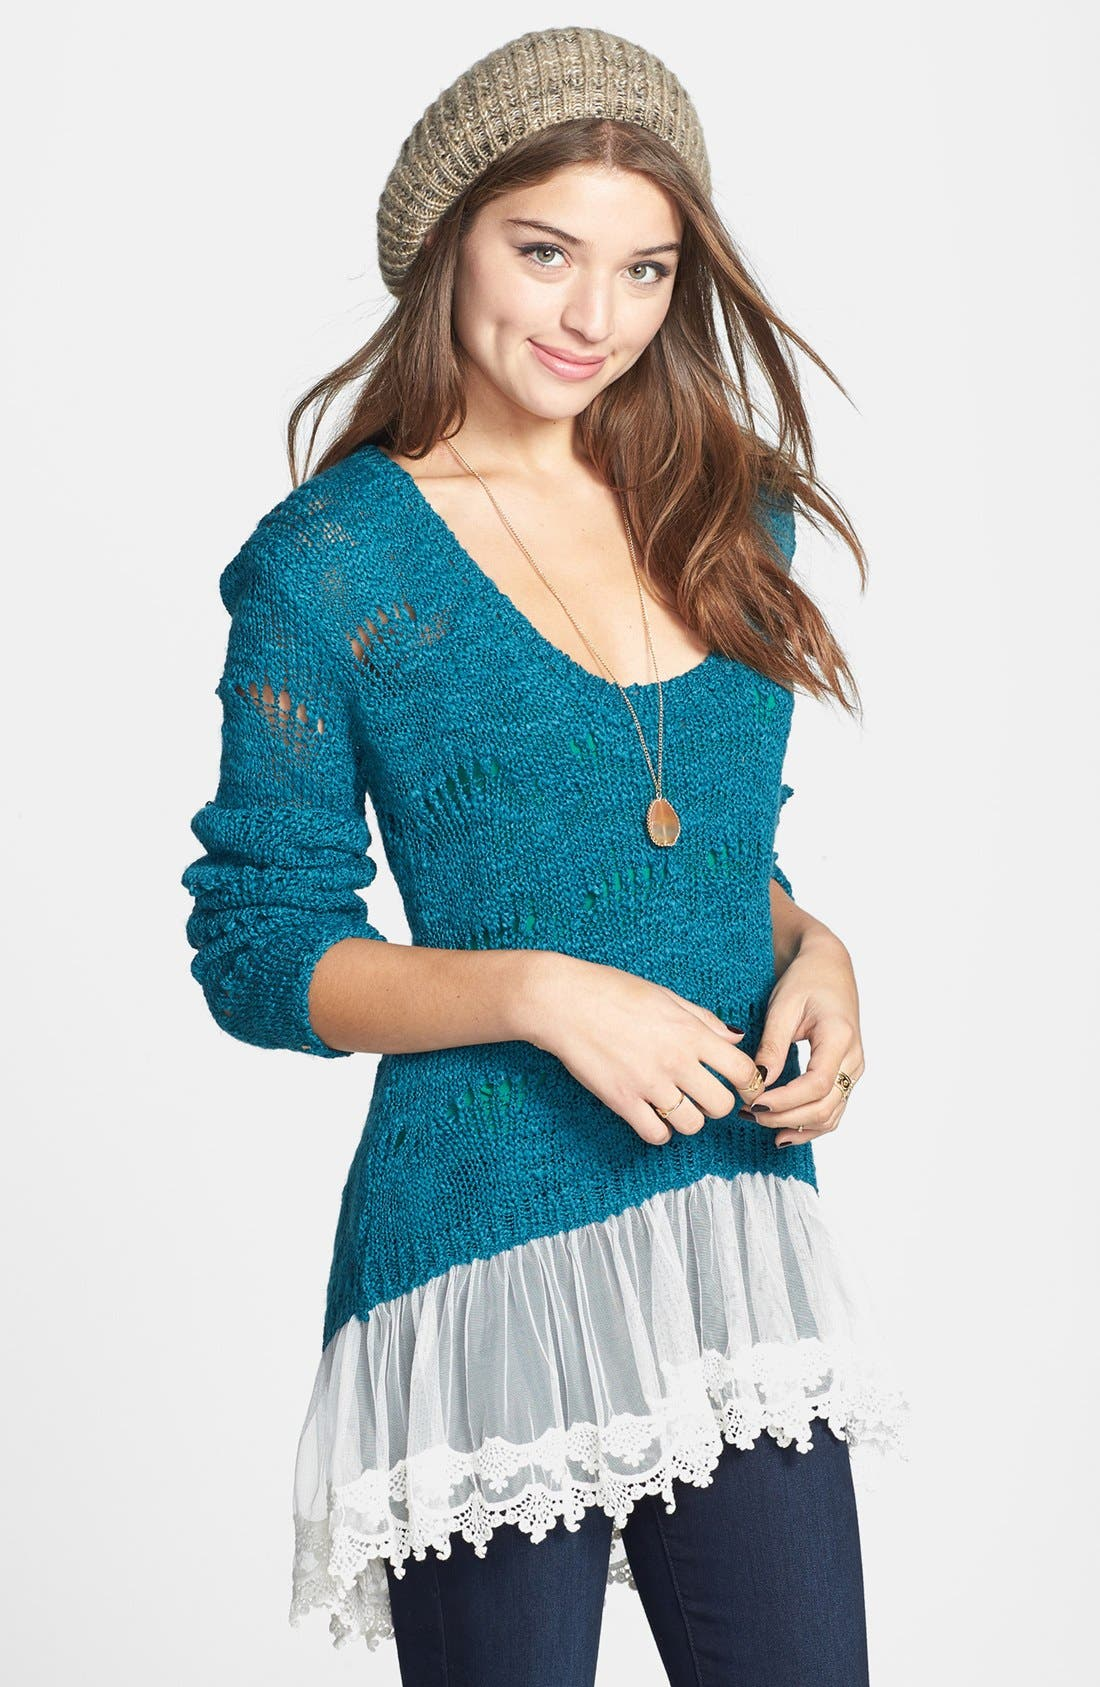 Alternate Image 1 Selected - Cotton Emporium Scallop Stitch Lace Hem Sweater (Juniors)